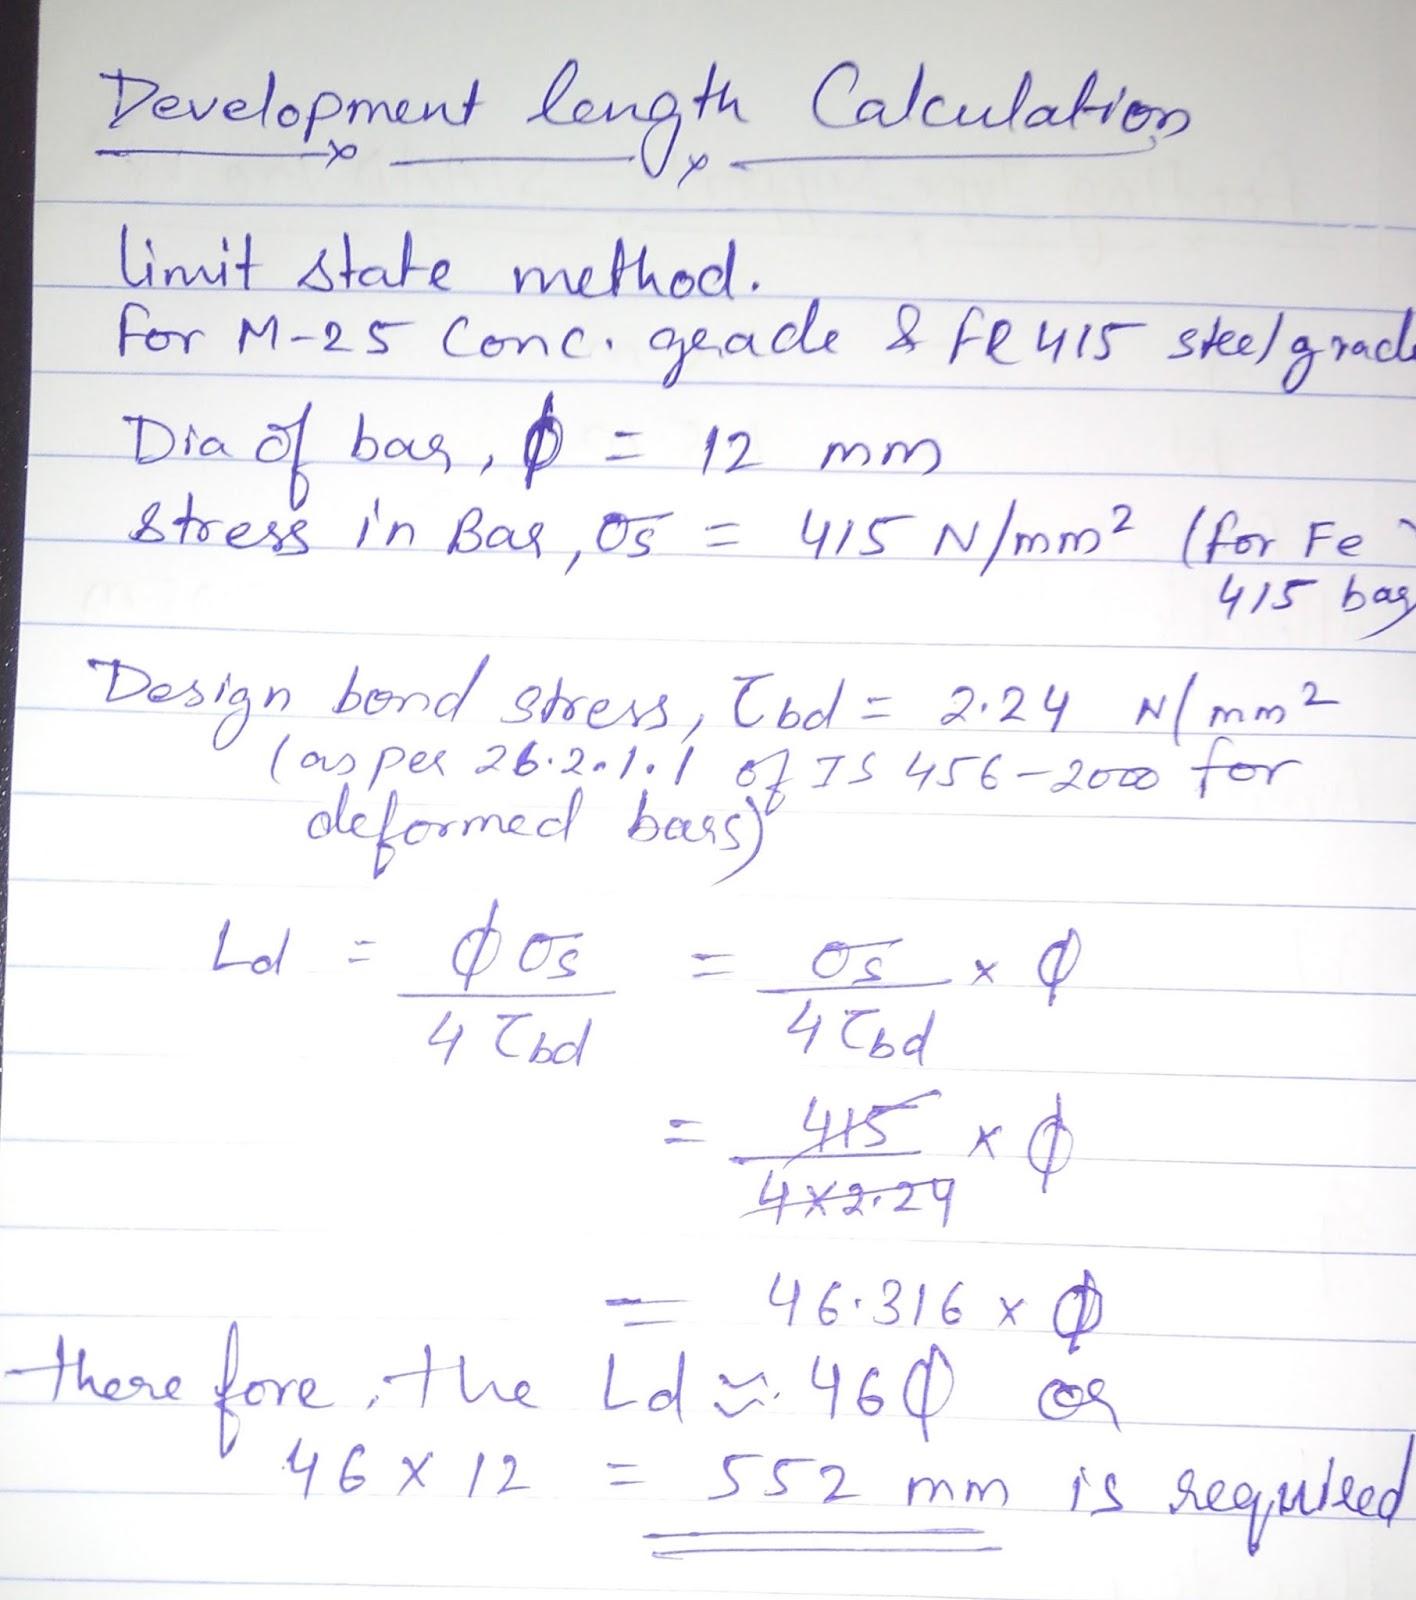 Civil Engineering: Development Length Calculation as per